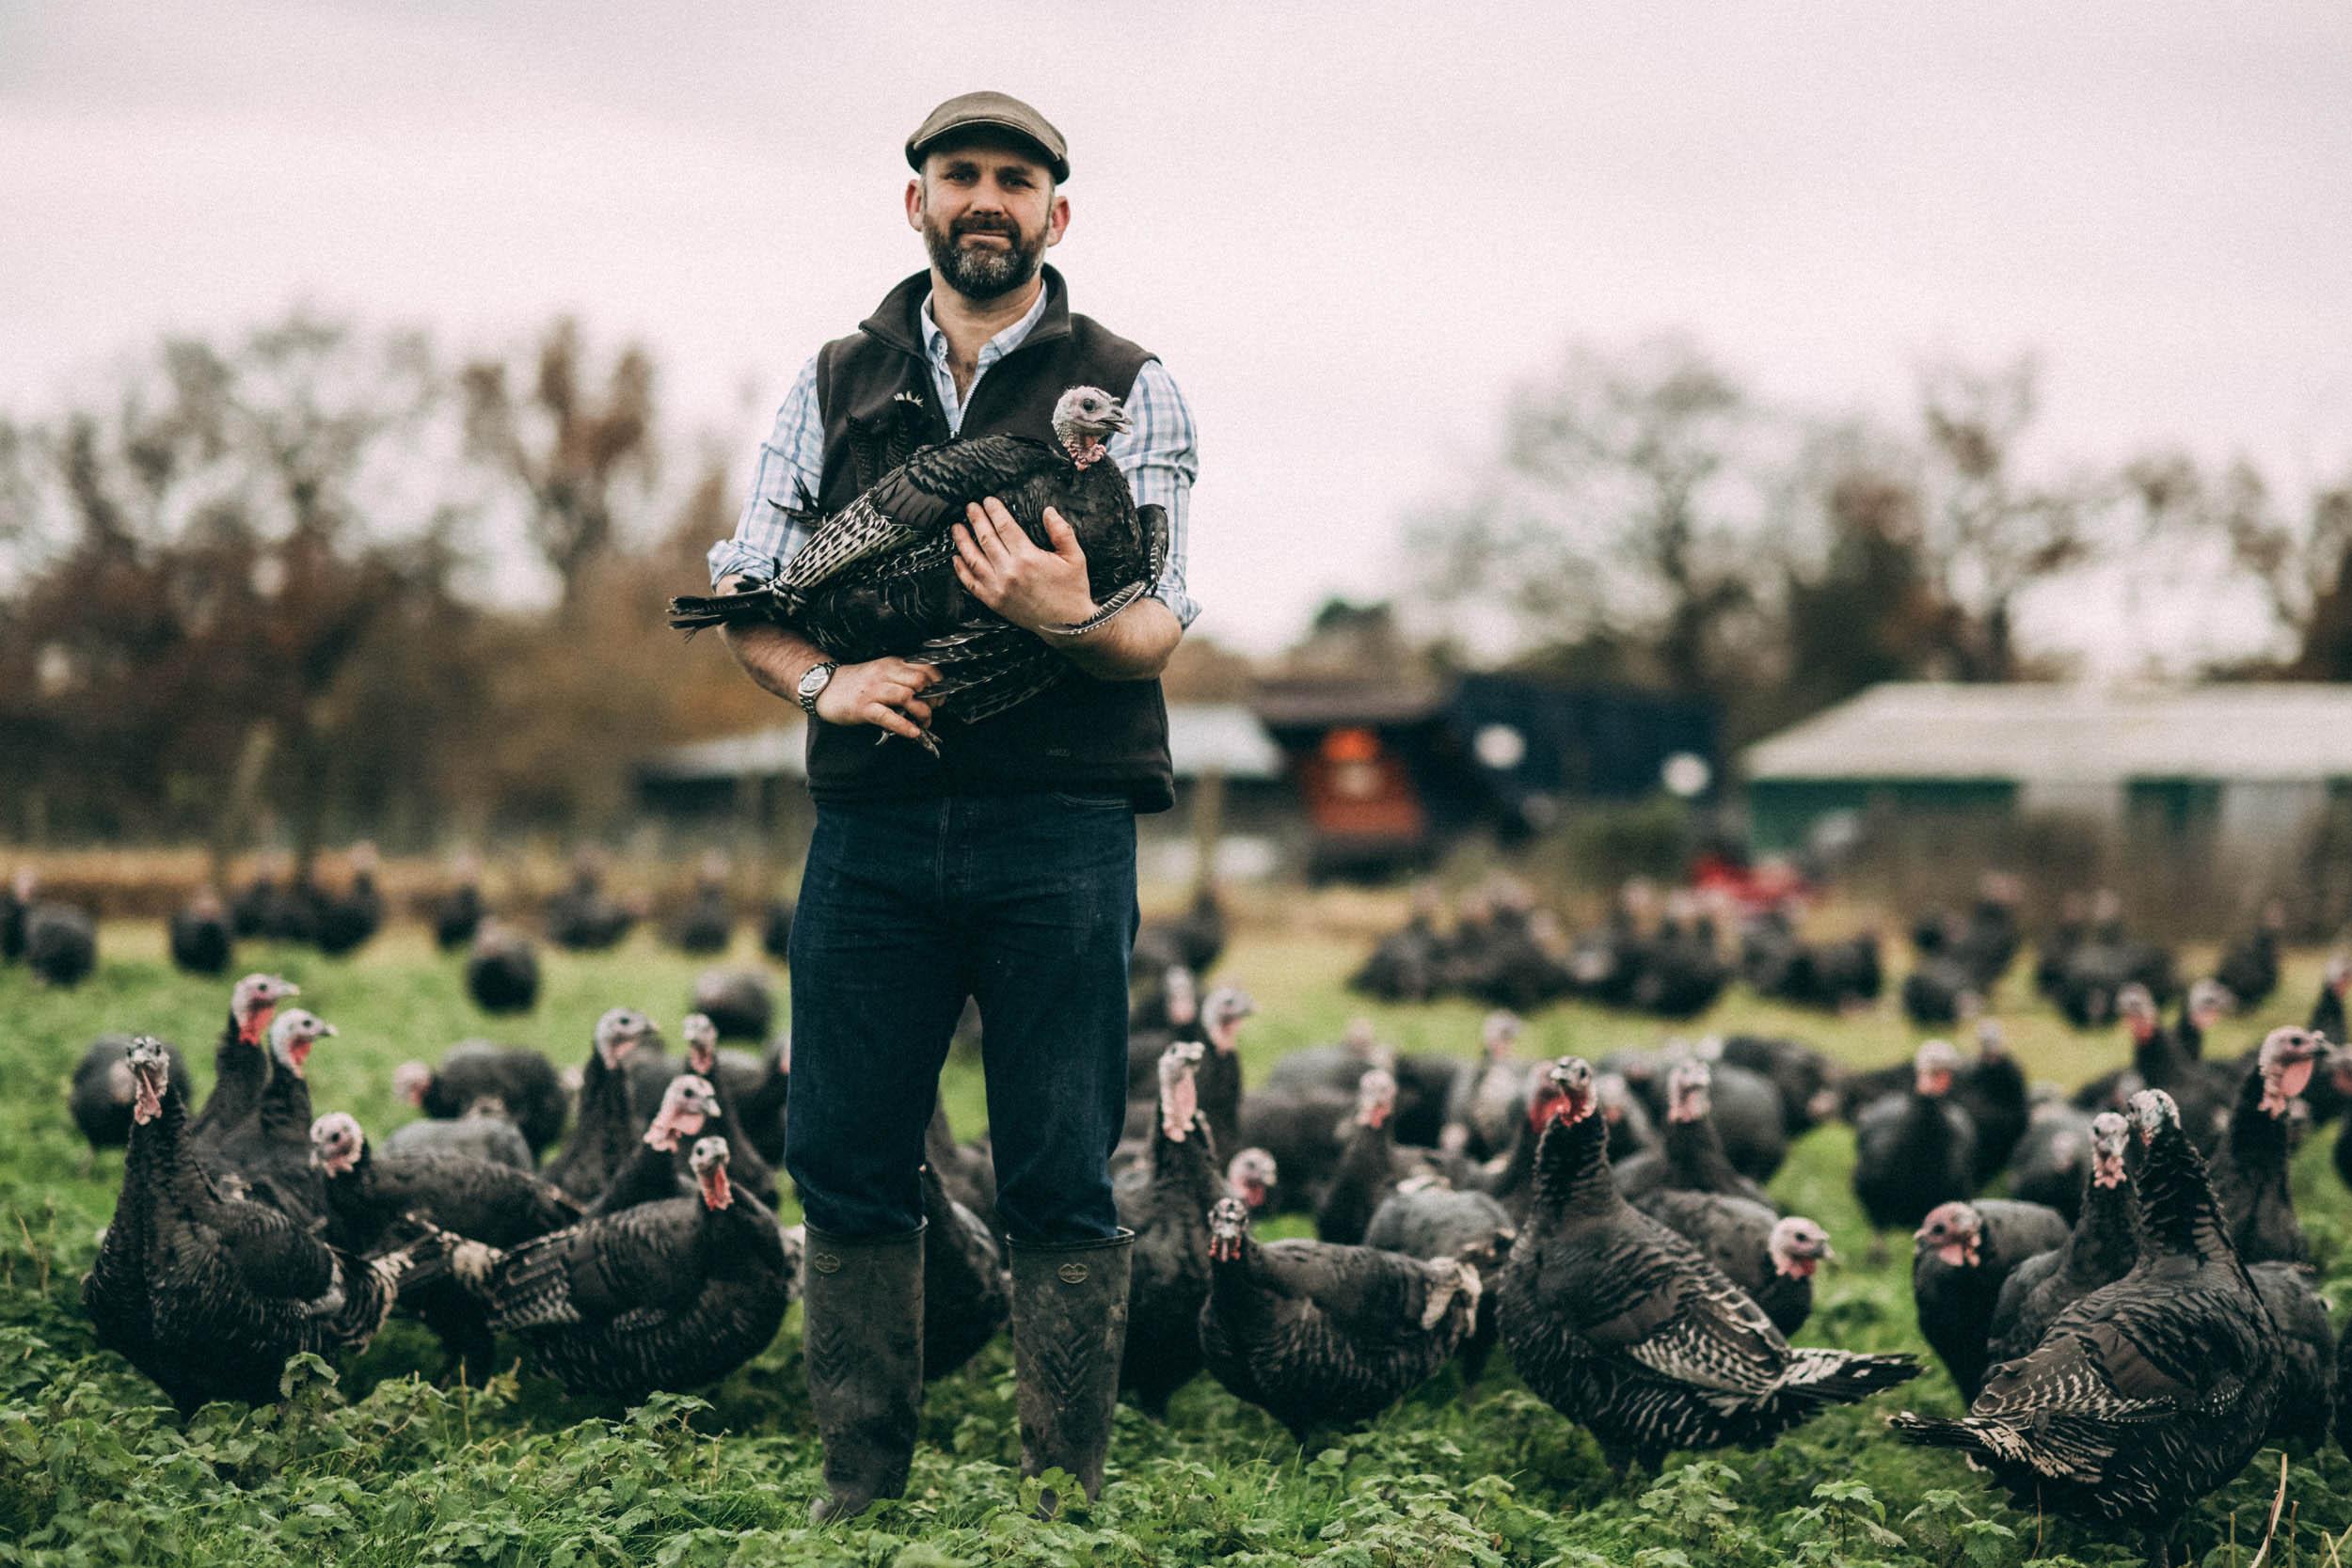 Bramble-farm-free-range-turkeys-surrey-153-adrian-joy.jpg